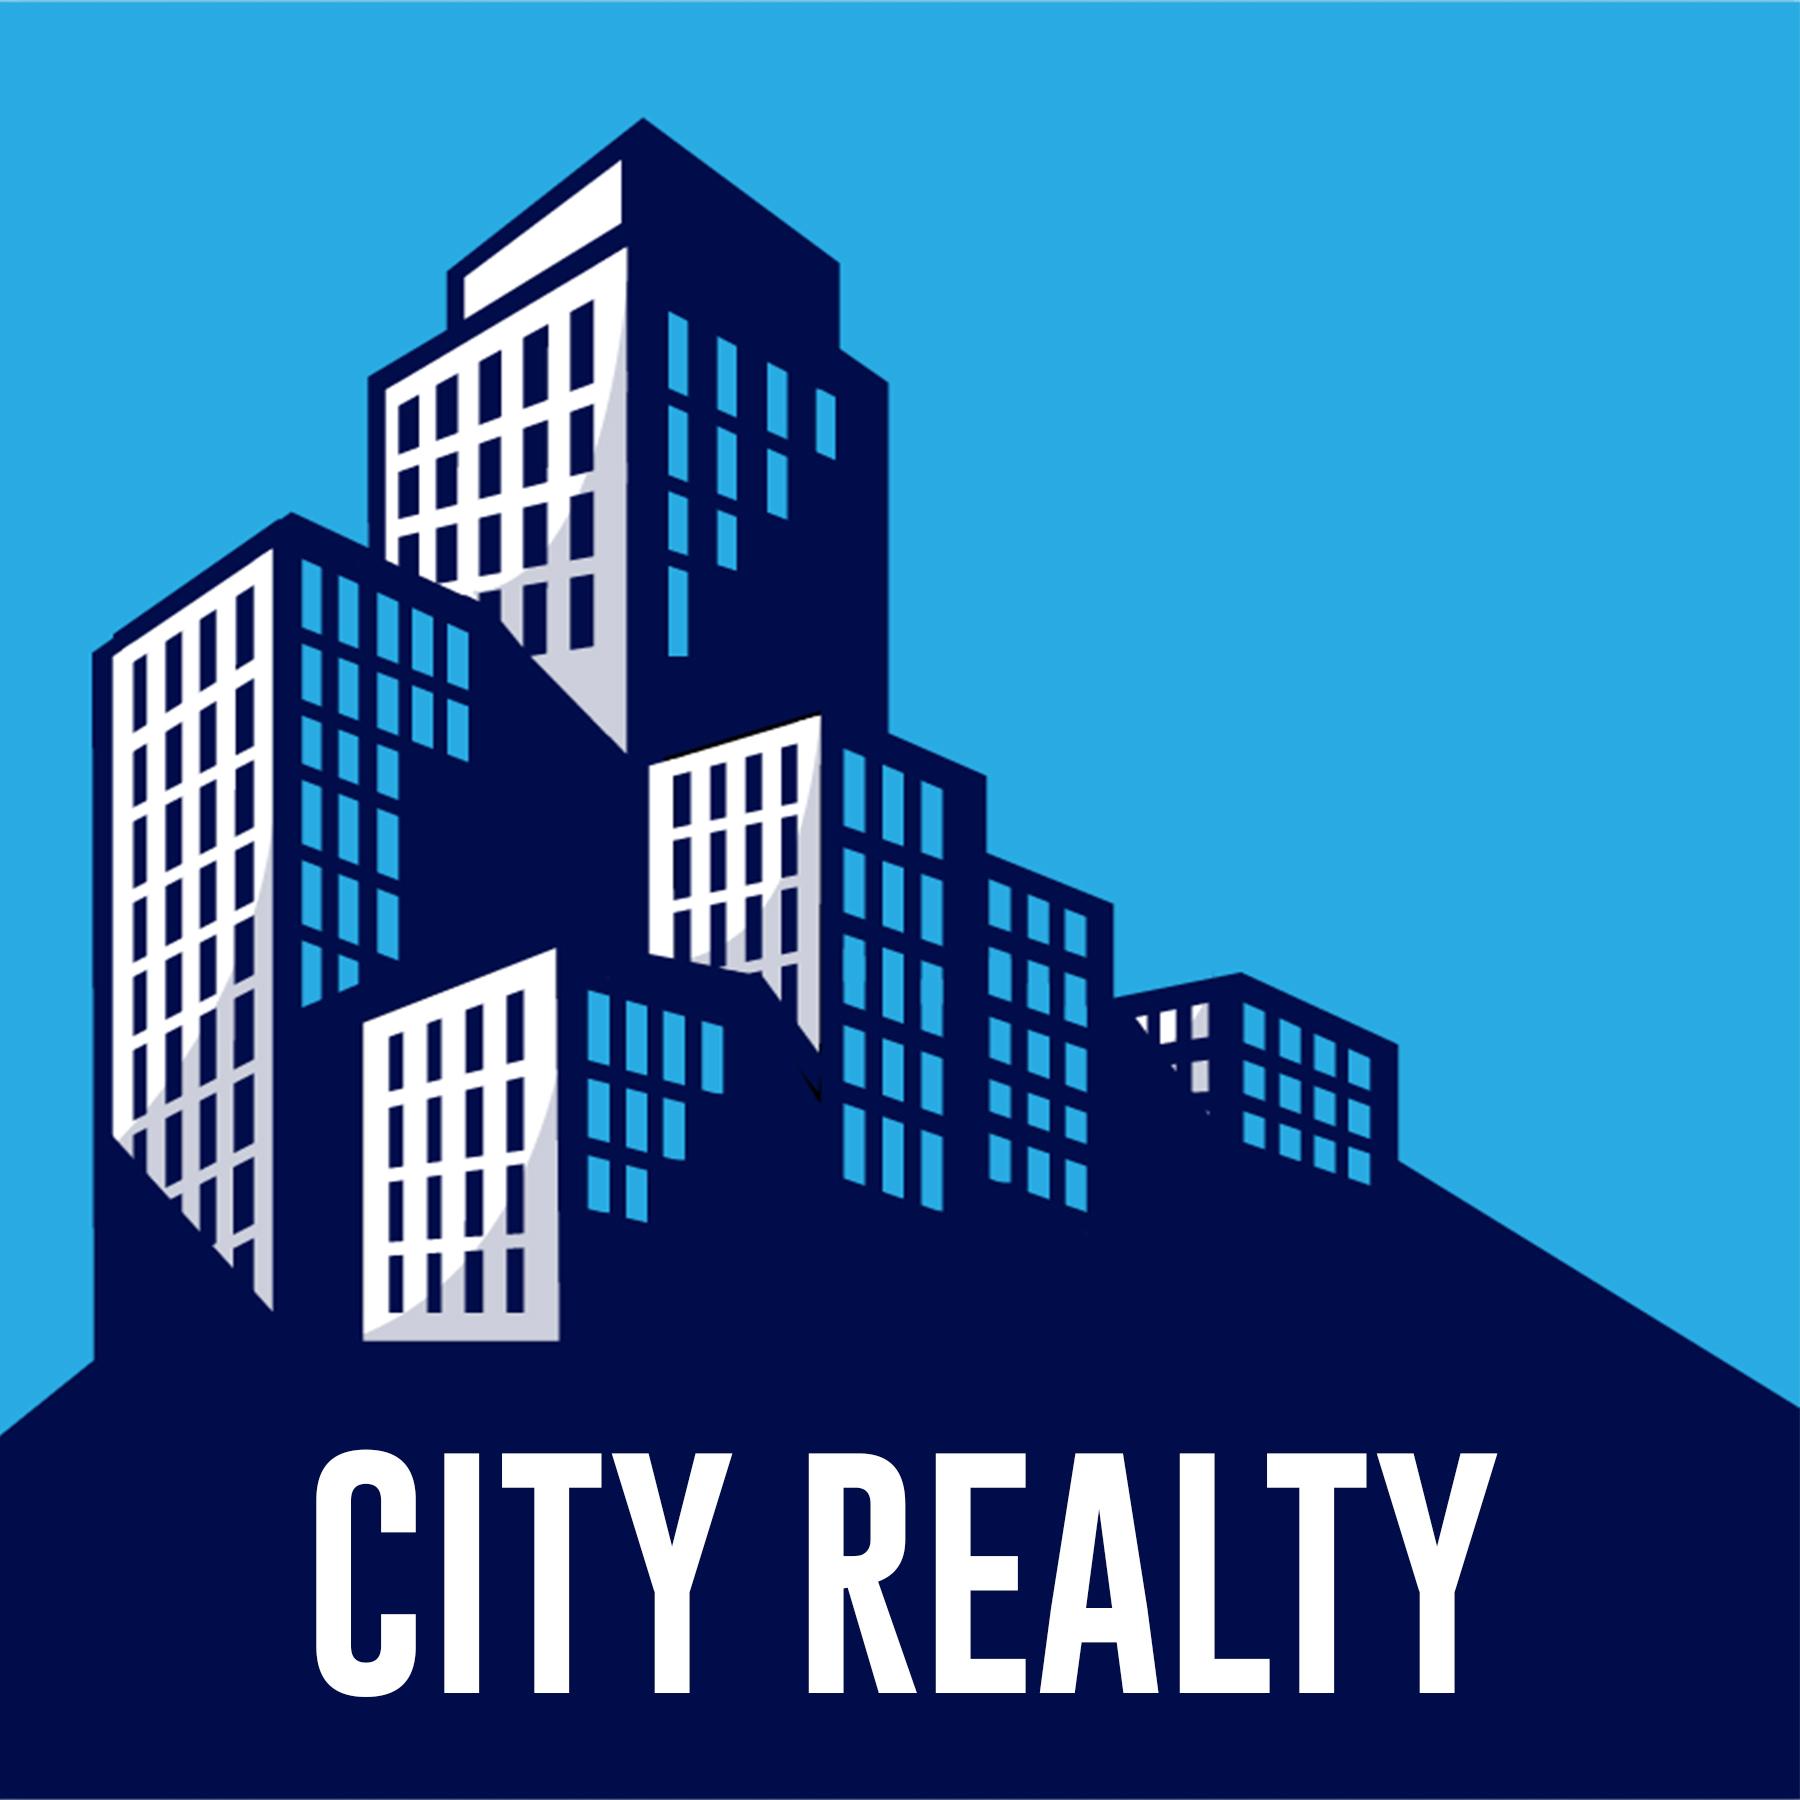 cityrealtylogoprofilepic_(1).jpg